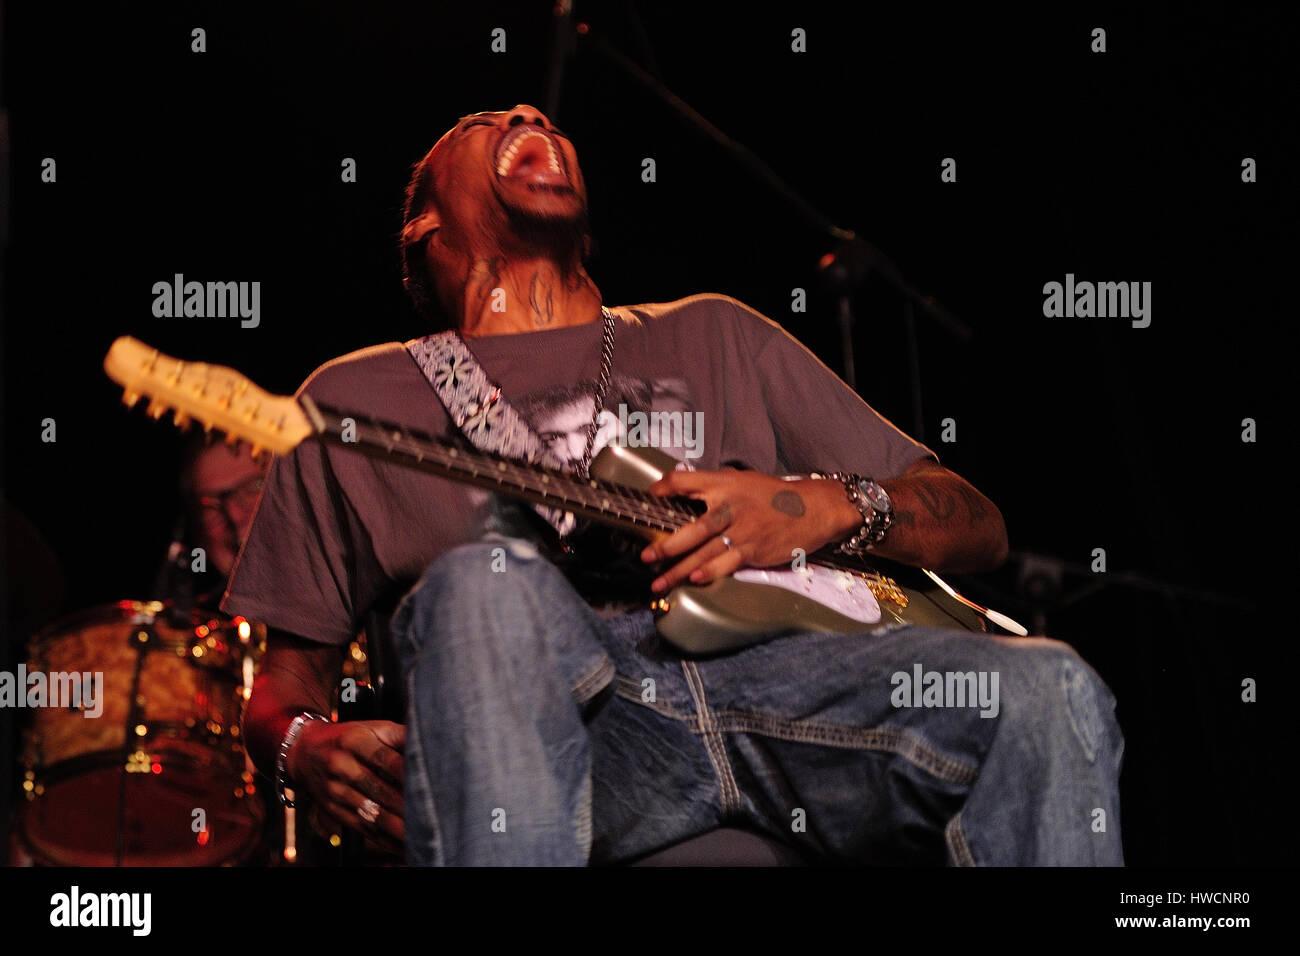 Eric Gales, (aka Raw Dawg) (born October 29, 1974, Memphis Tennessee,Blues-rock, hard rock, blues, heavy metal,Musician, Stock Photo